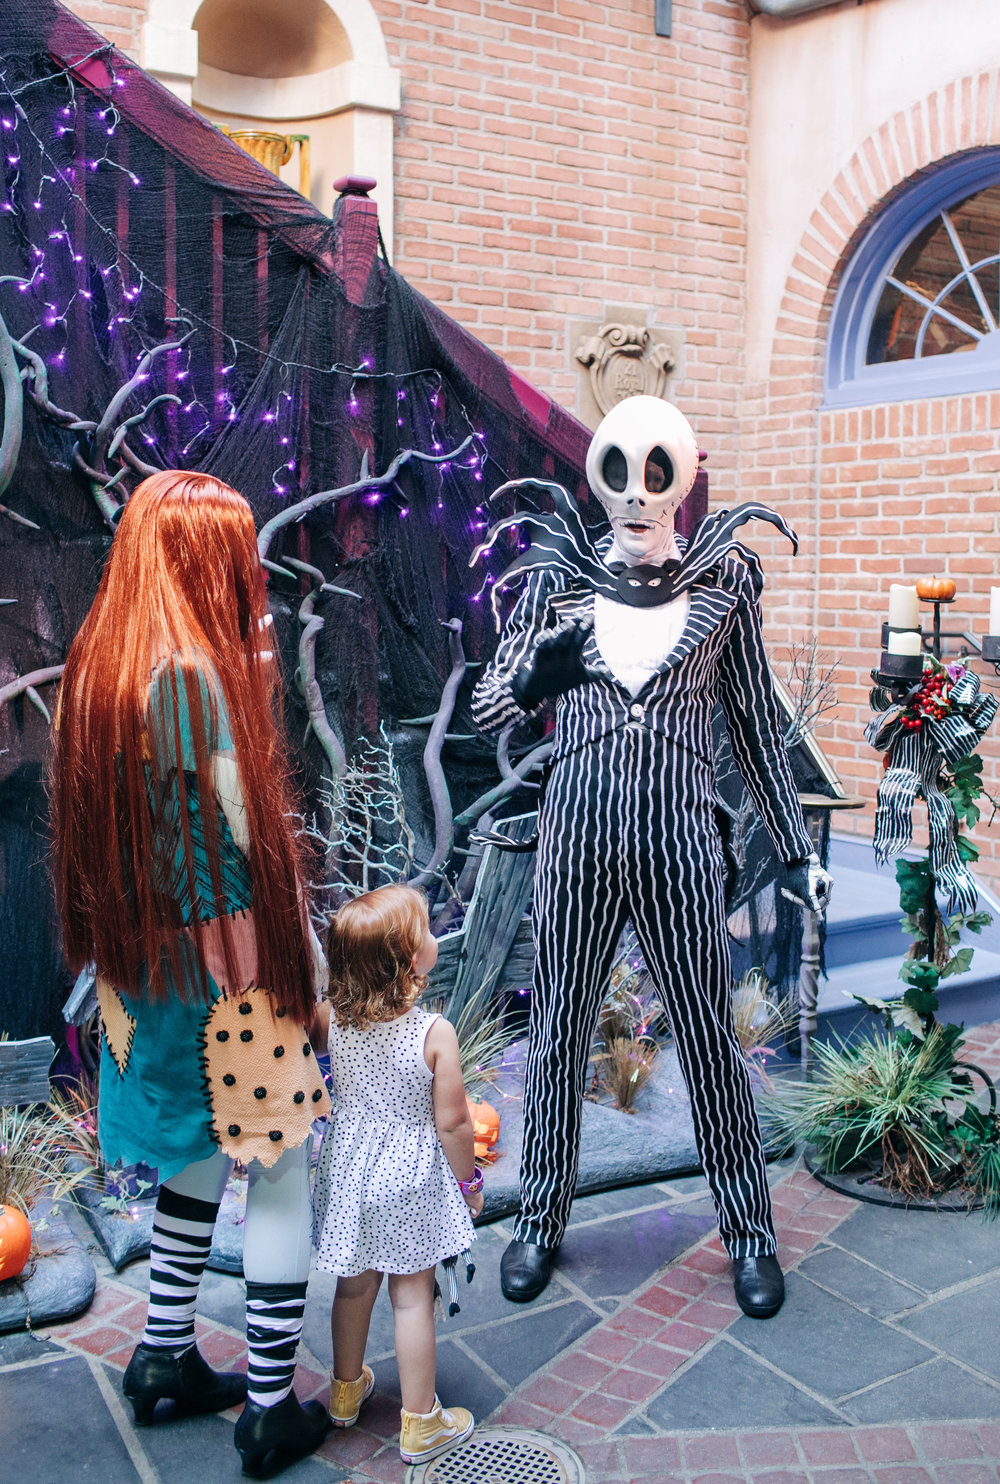 Disneyland_Halloween-LilyRoPhotography-101.jpg